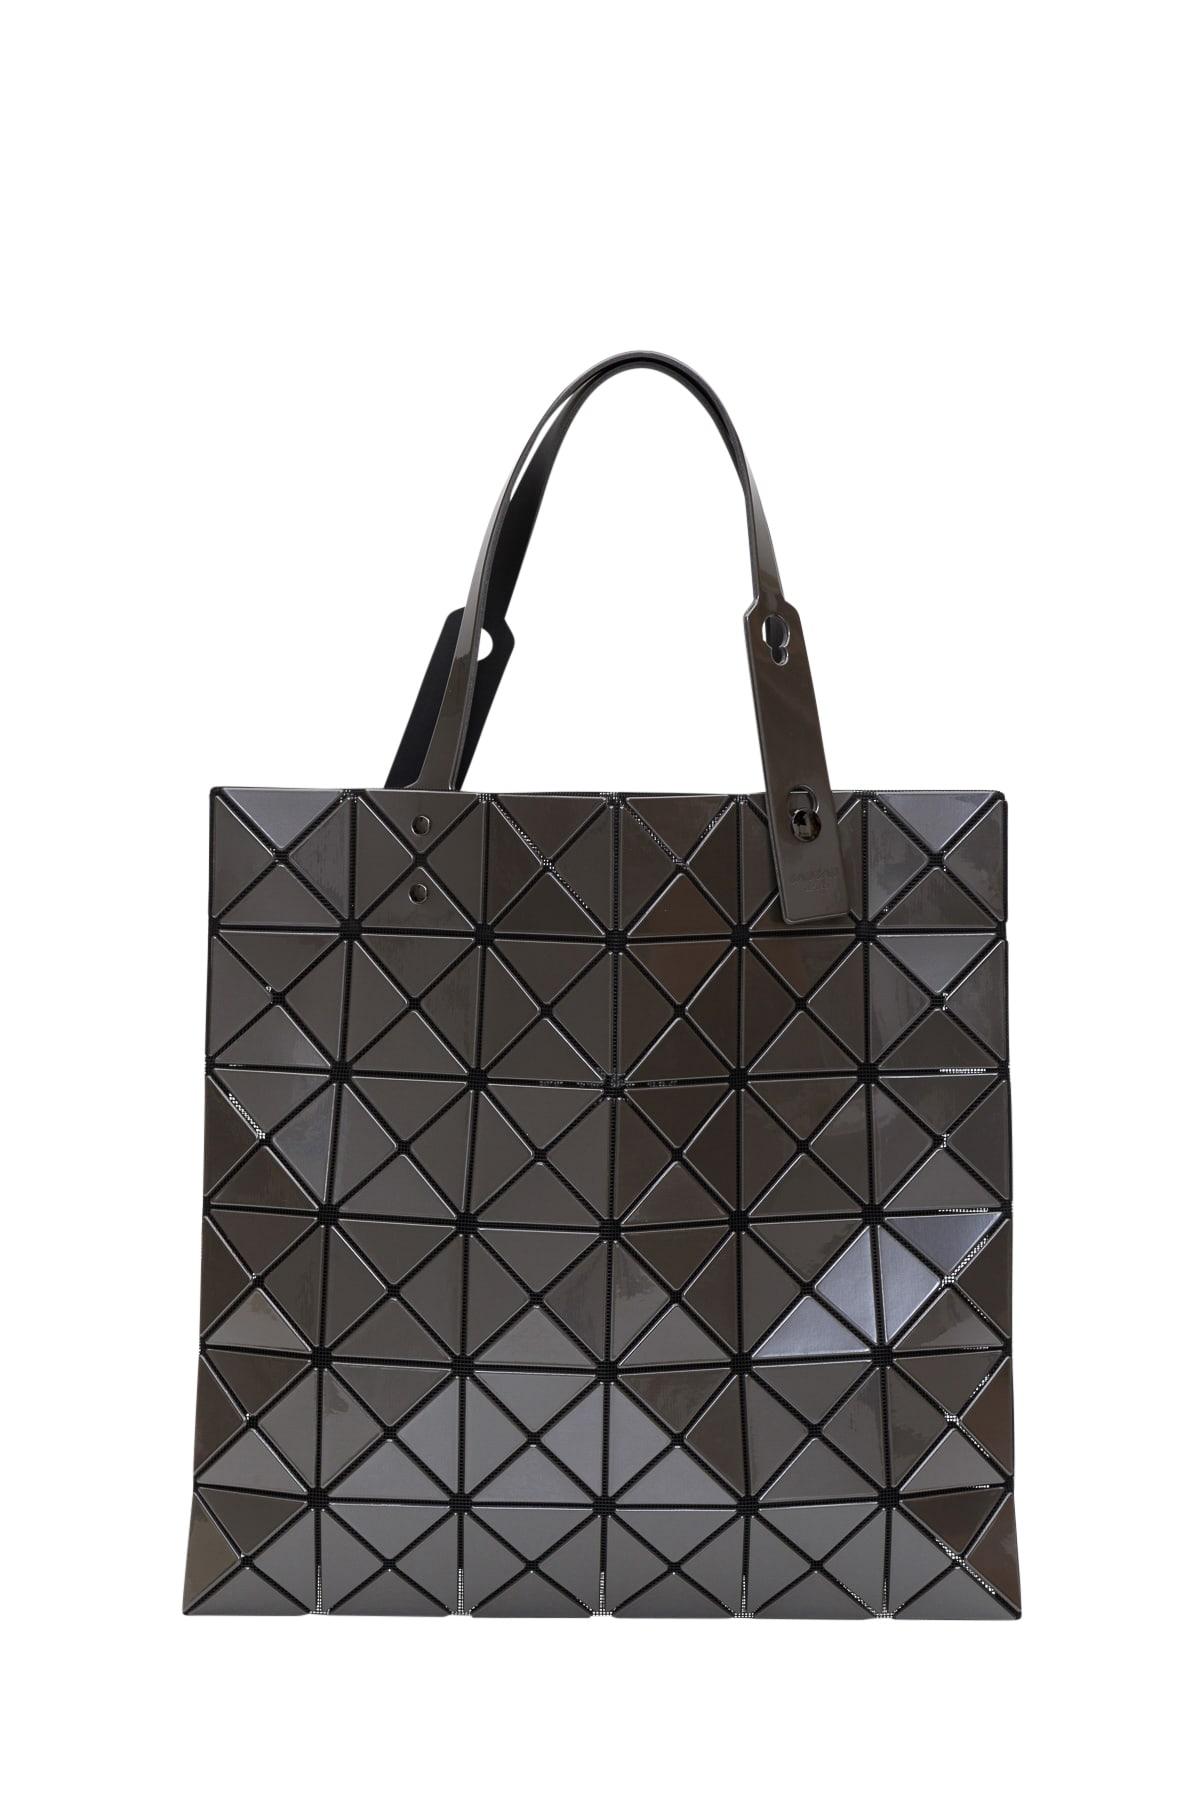 High Quality BAO BAO Issey Miyake Metallic BLACK TOTE Bag  NEW